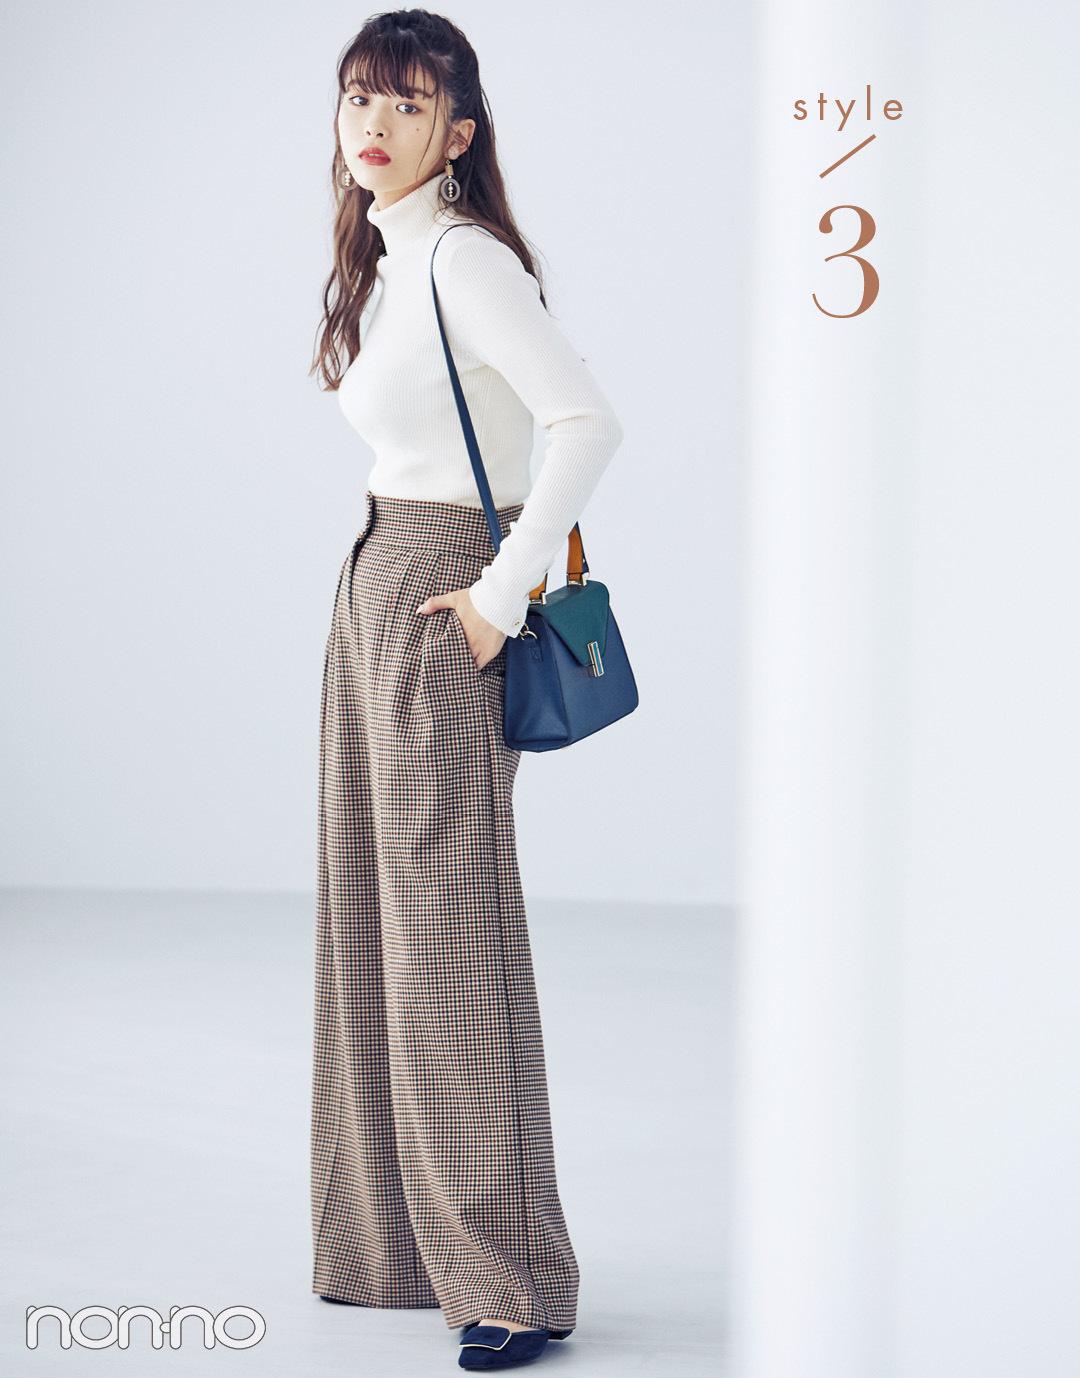 style/3